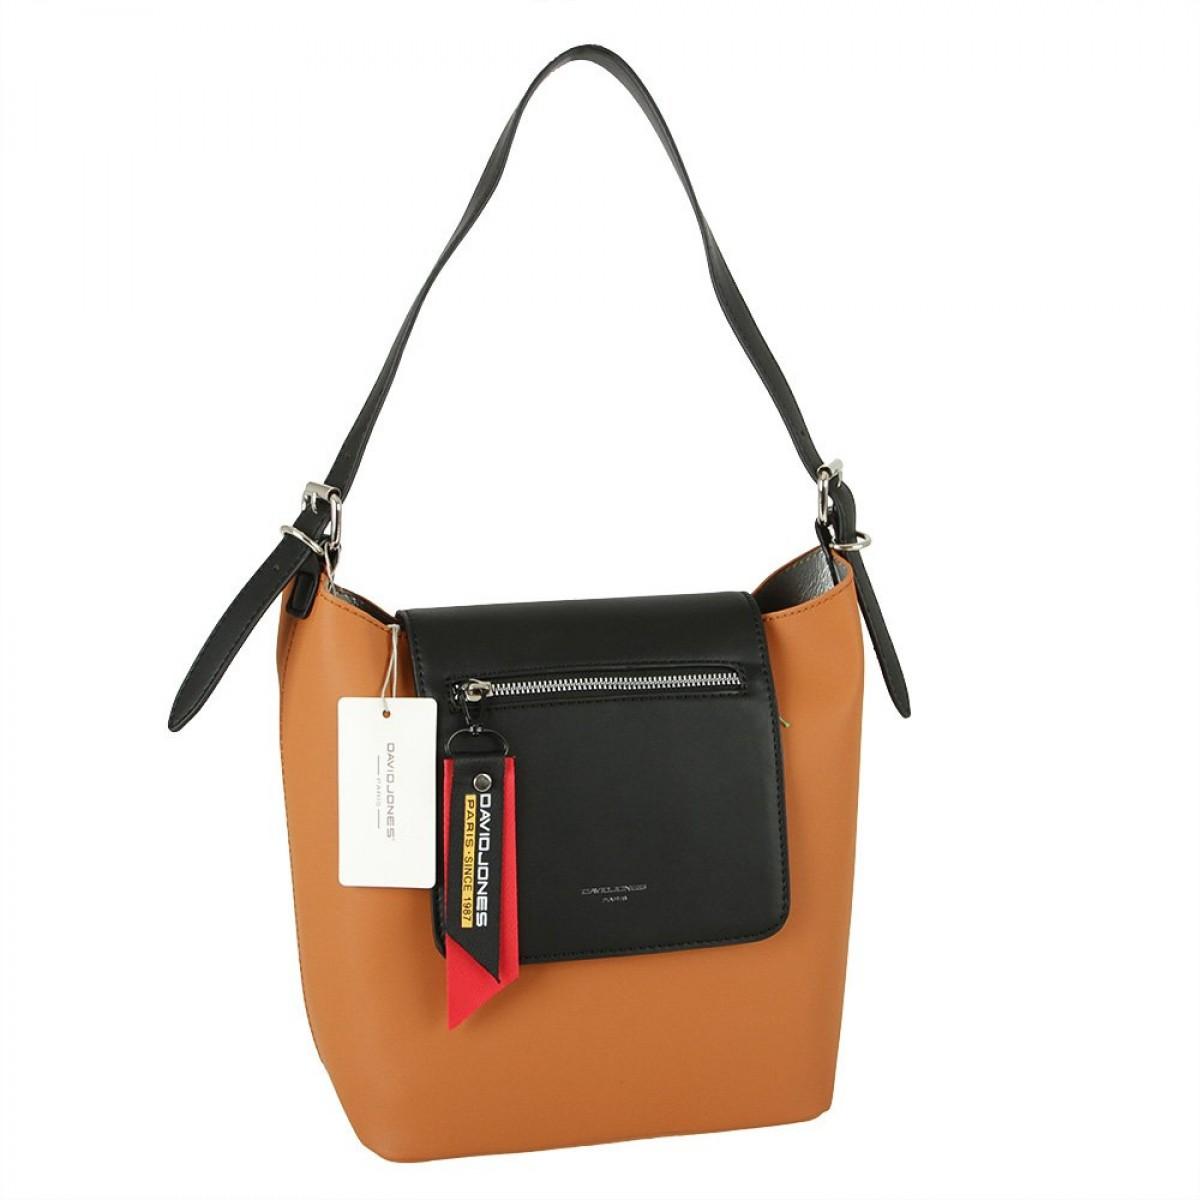 Жіноча сумка David Jones CM5828 CARAMEL